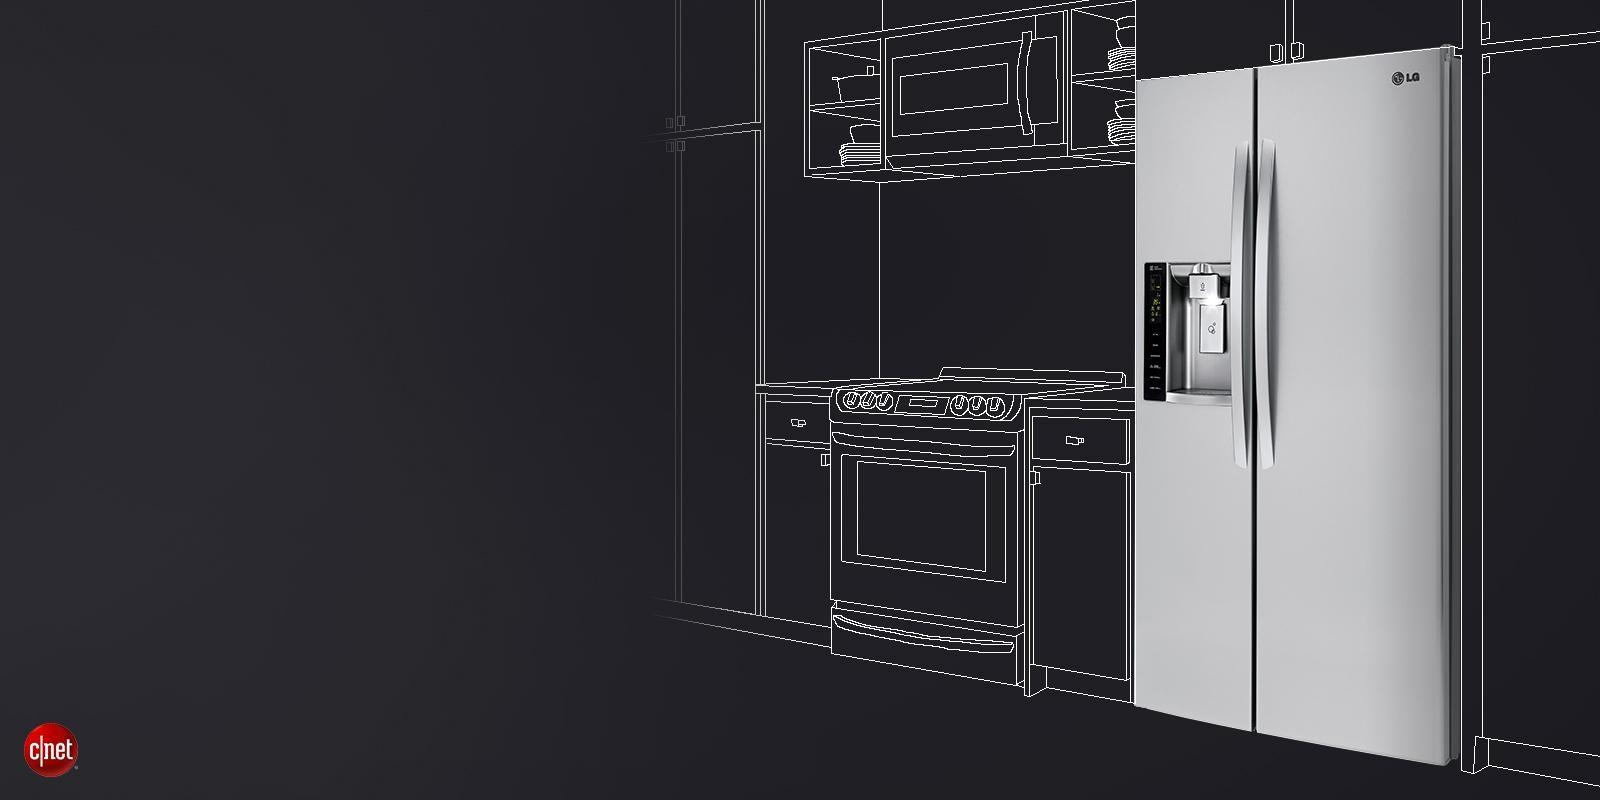 bb47c46741 LG Counter-Depth Refrigerators with Large Capacity